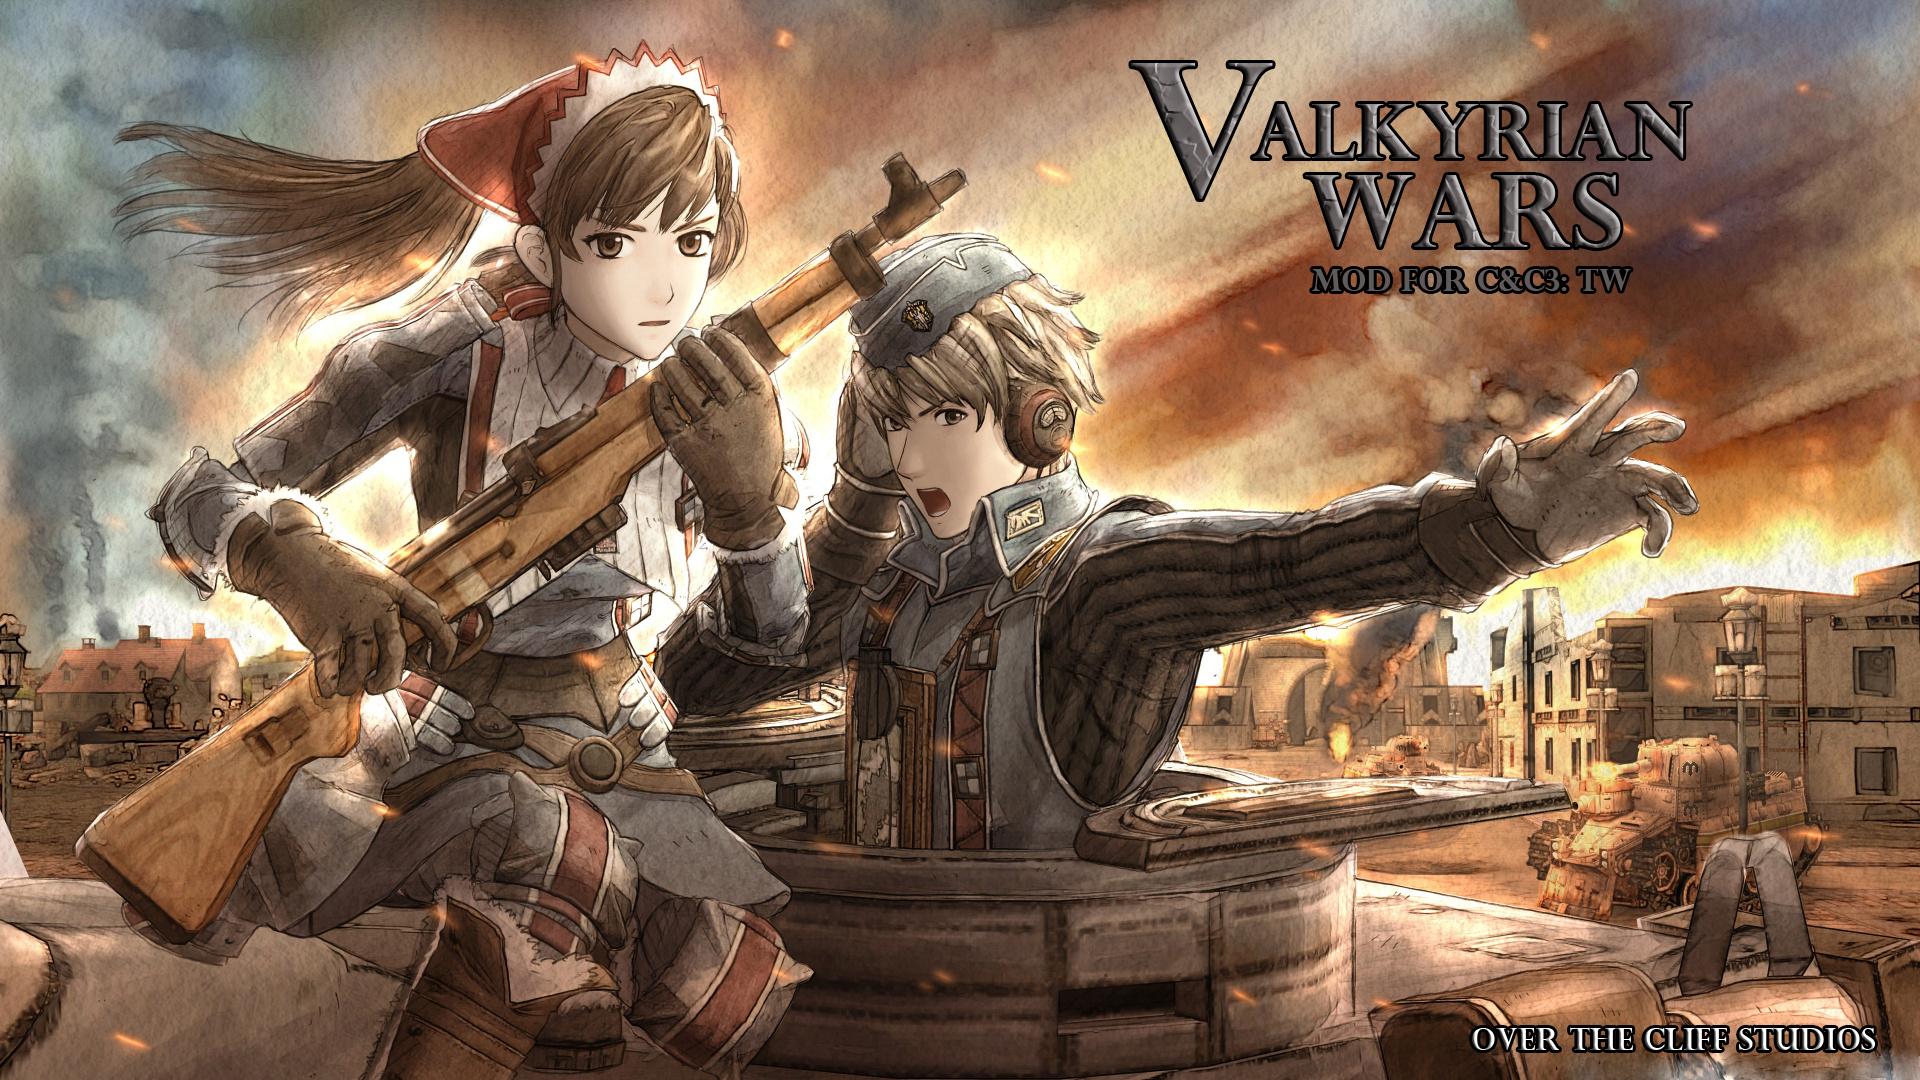 Tank Girl Wallpaper Android Valkyrian Wars Mod Mod Db